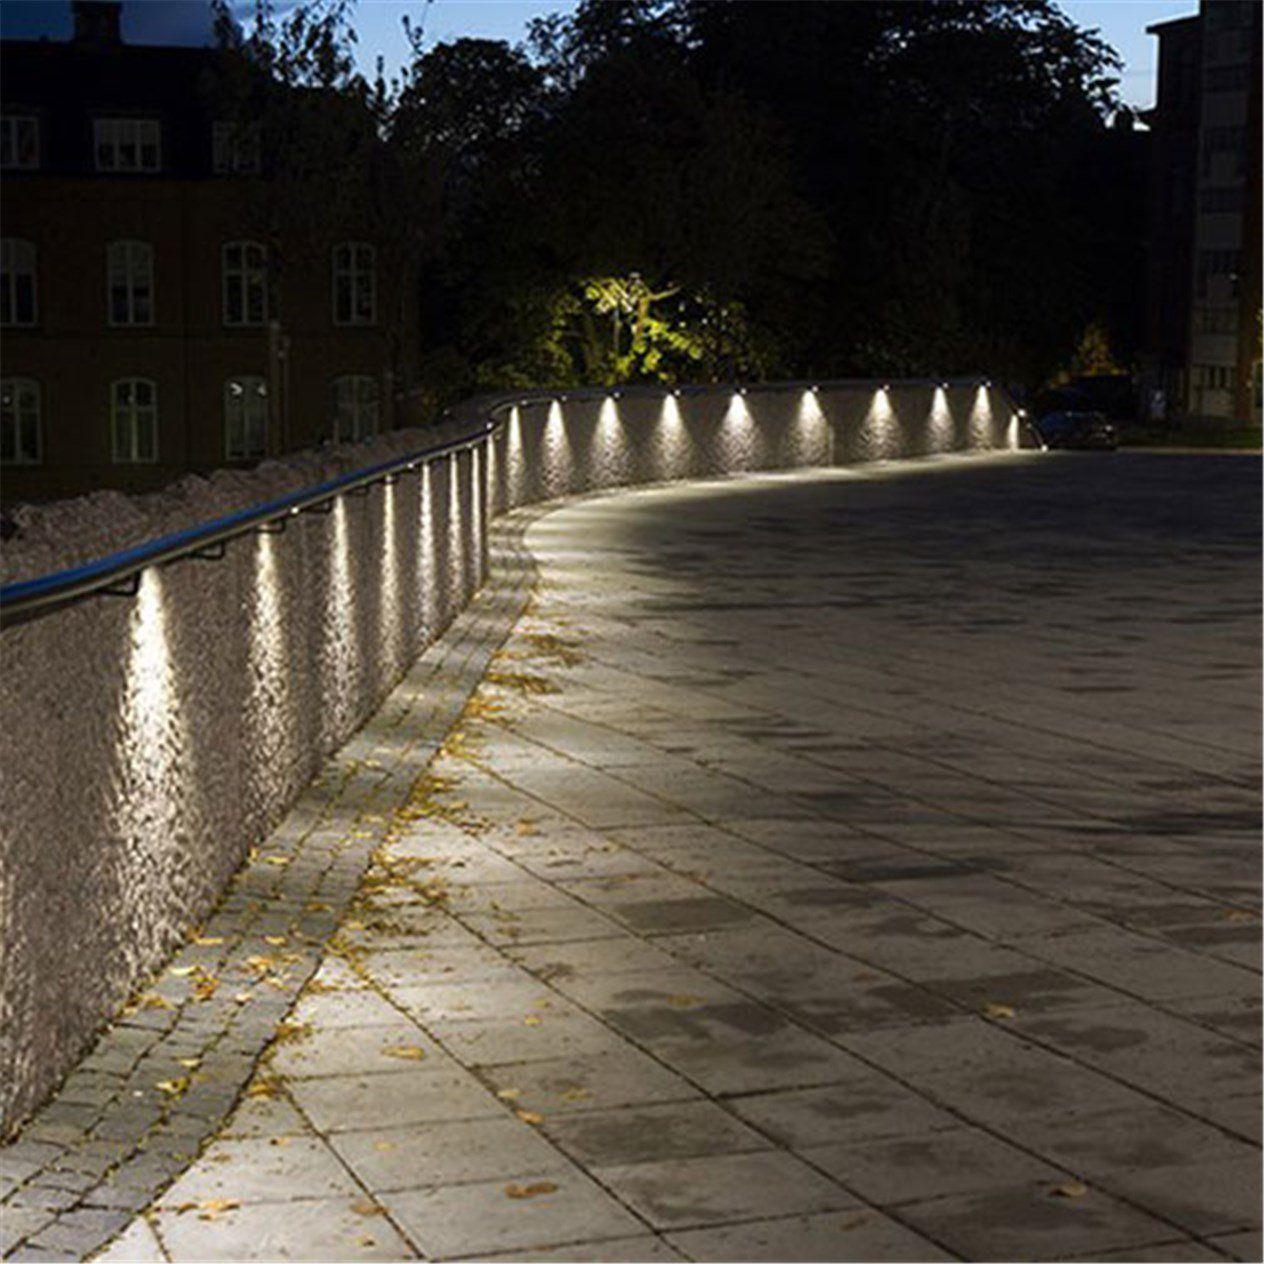 Inredning led belysning altan : Downlight Hide-a-lite Spot Mini 3-pack | Inredning